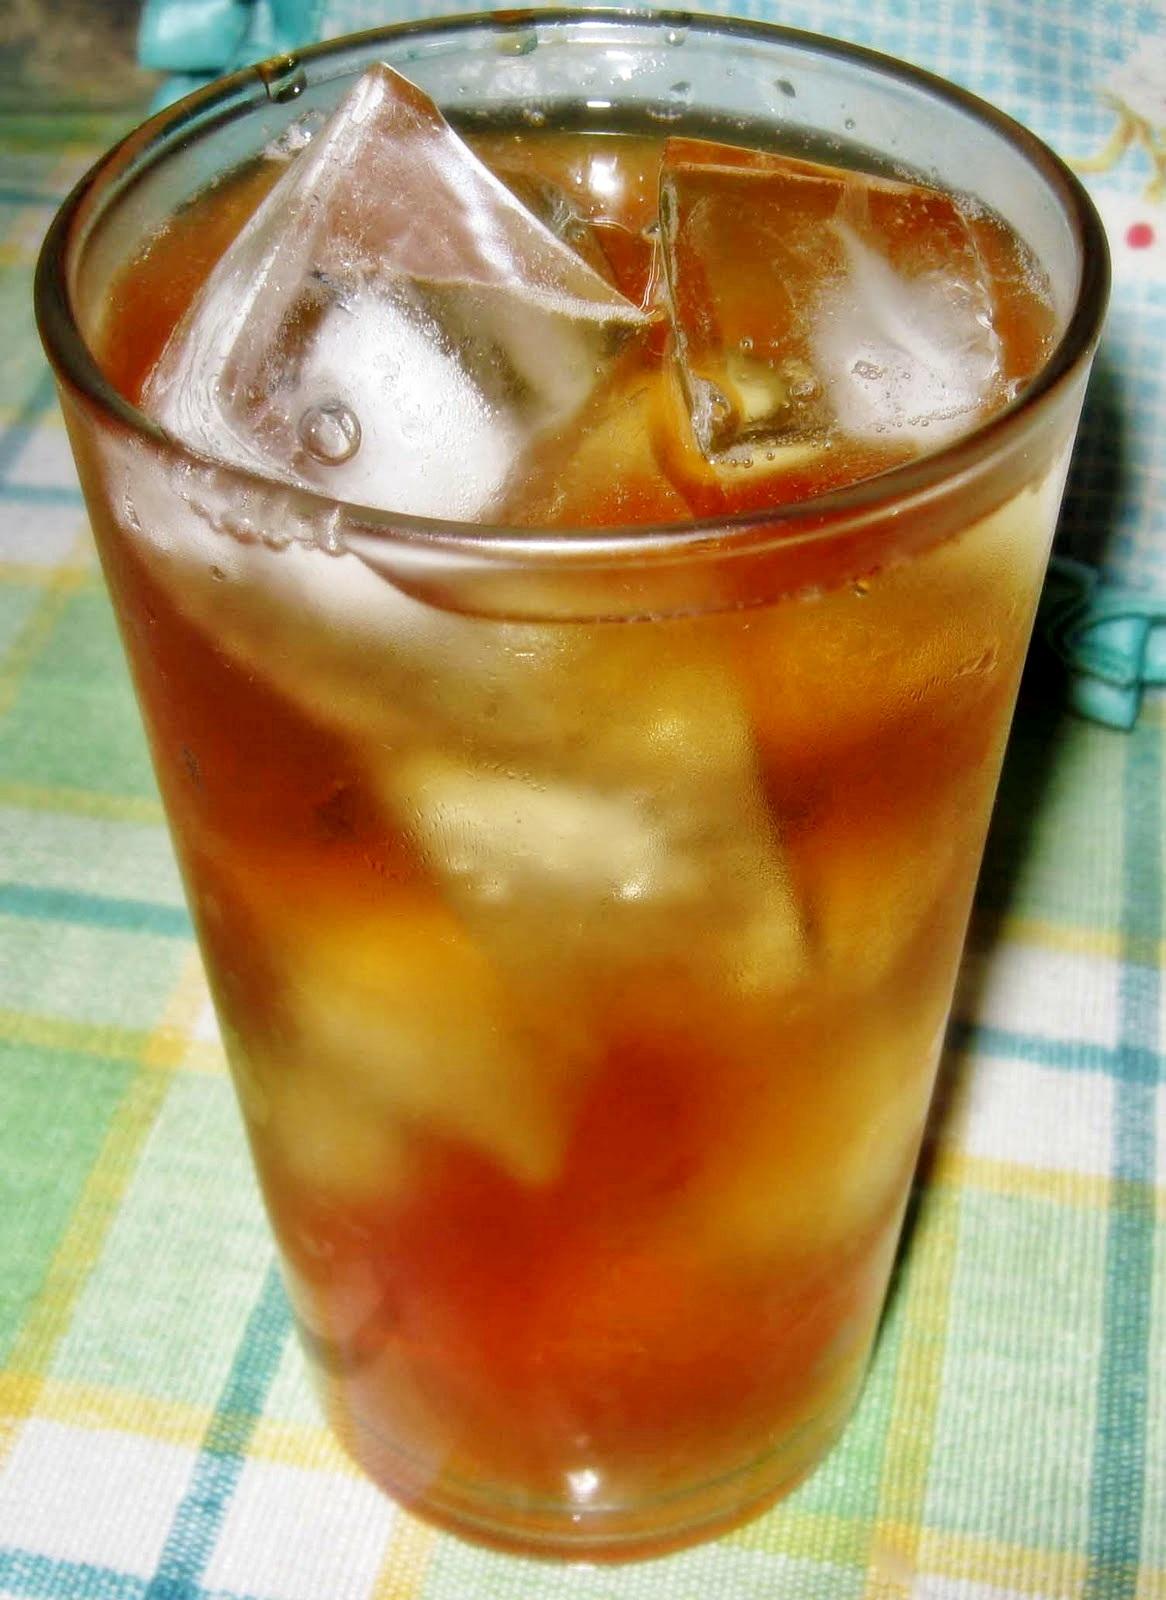 ... minuman es teh untuk kesehatan anda artikelsehatbugar minuman teh